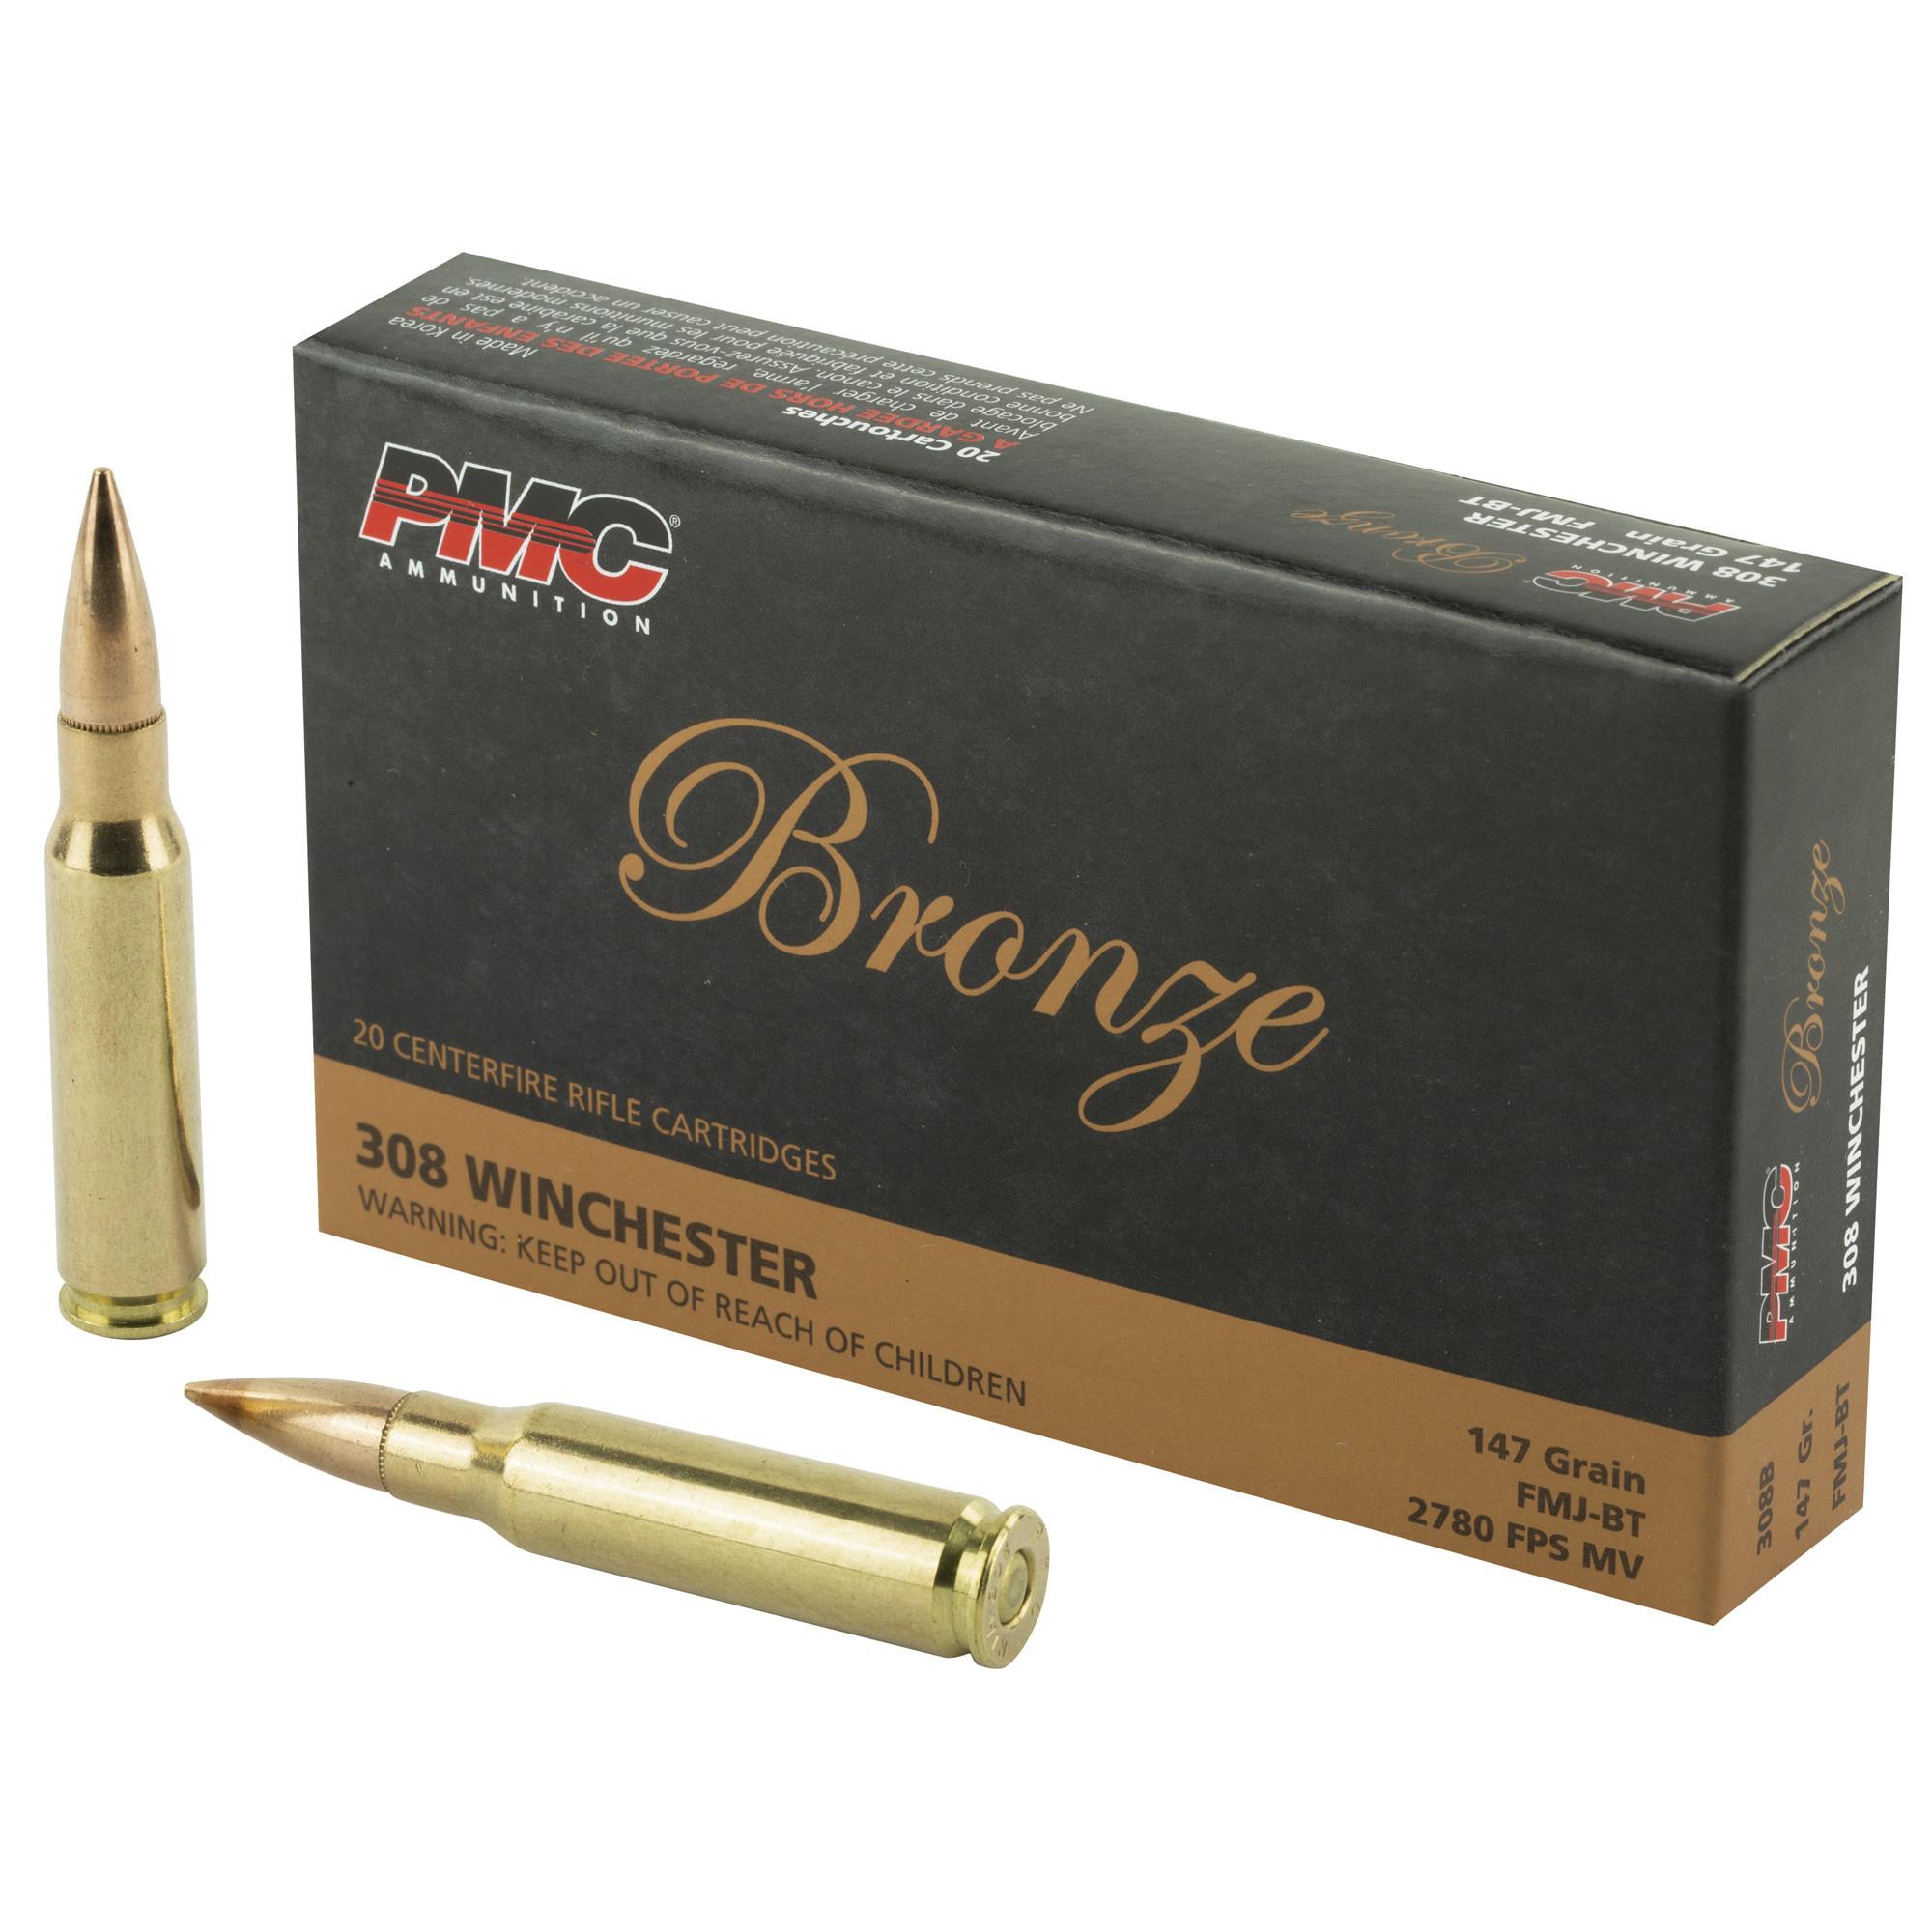 PMC Bronze 308 WIN 20rd Box 147gr FMJ-BT